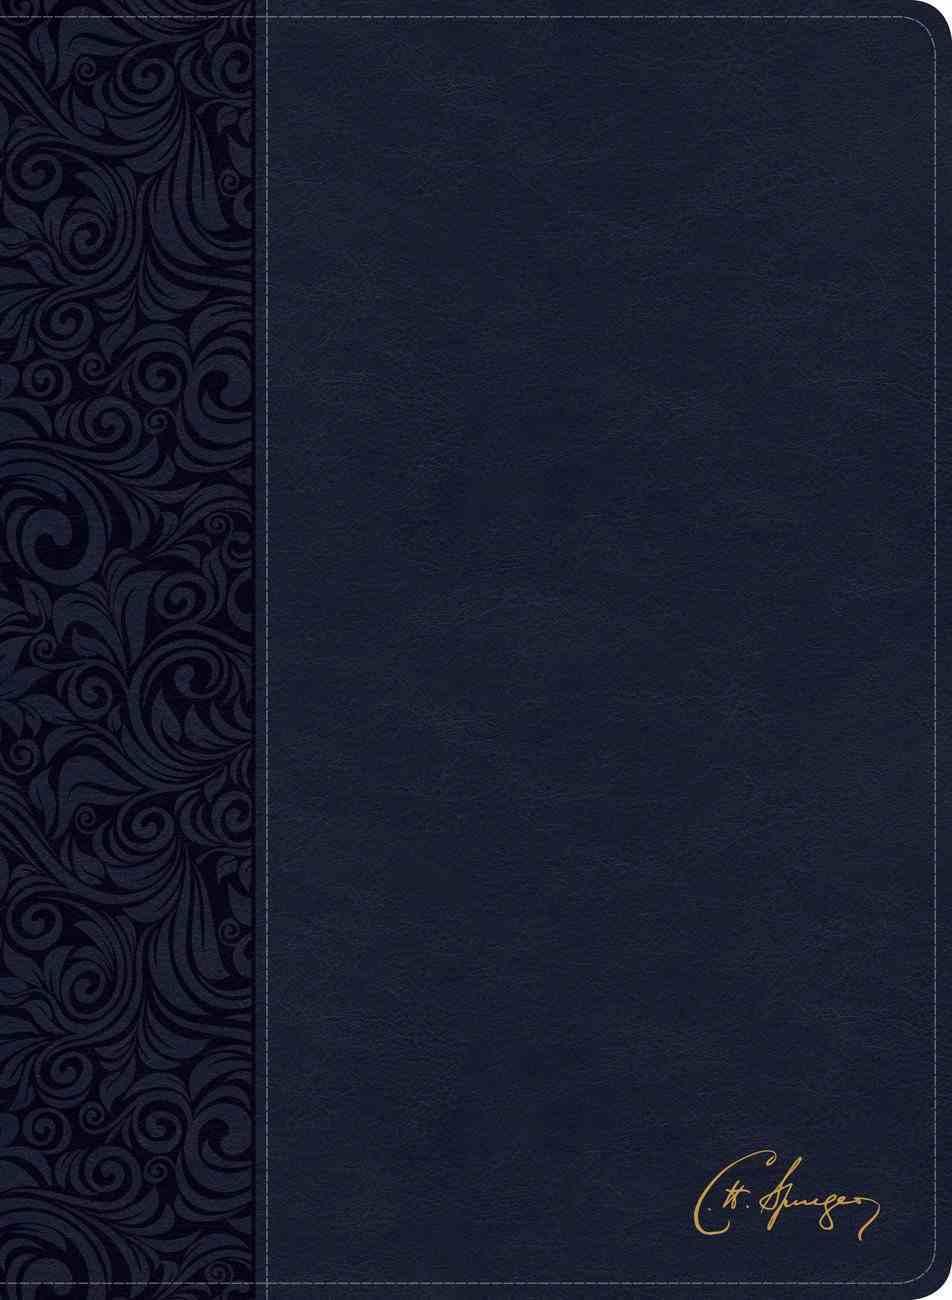 CSB Spurgeon Study Bible Navy (Black Letter Edition) Imitation Leather